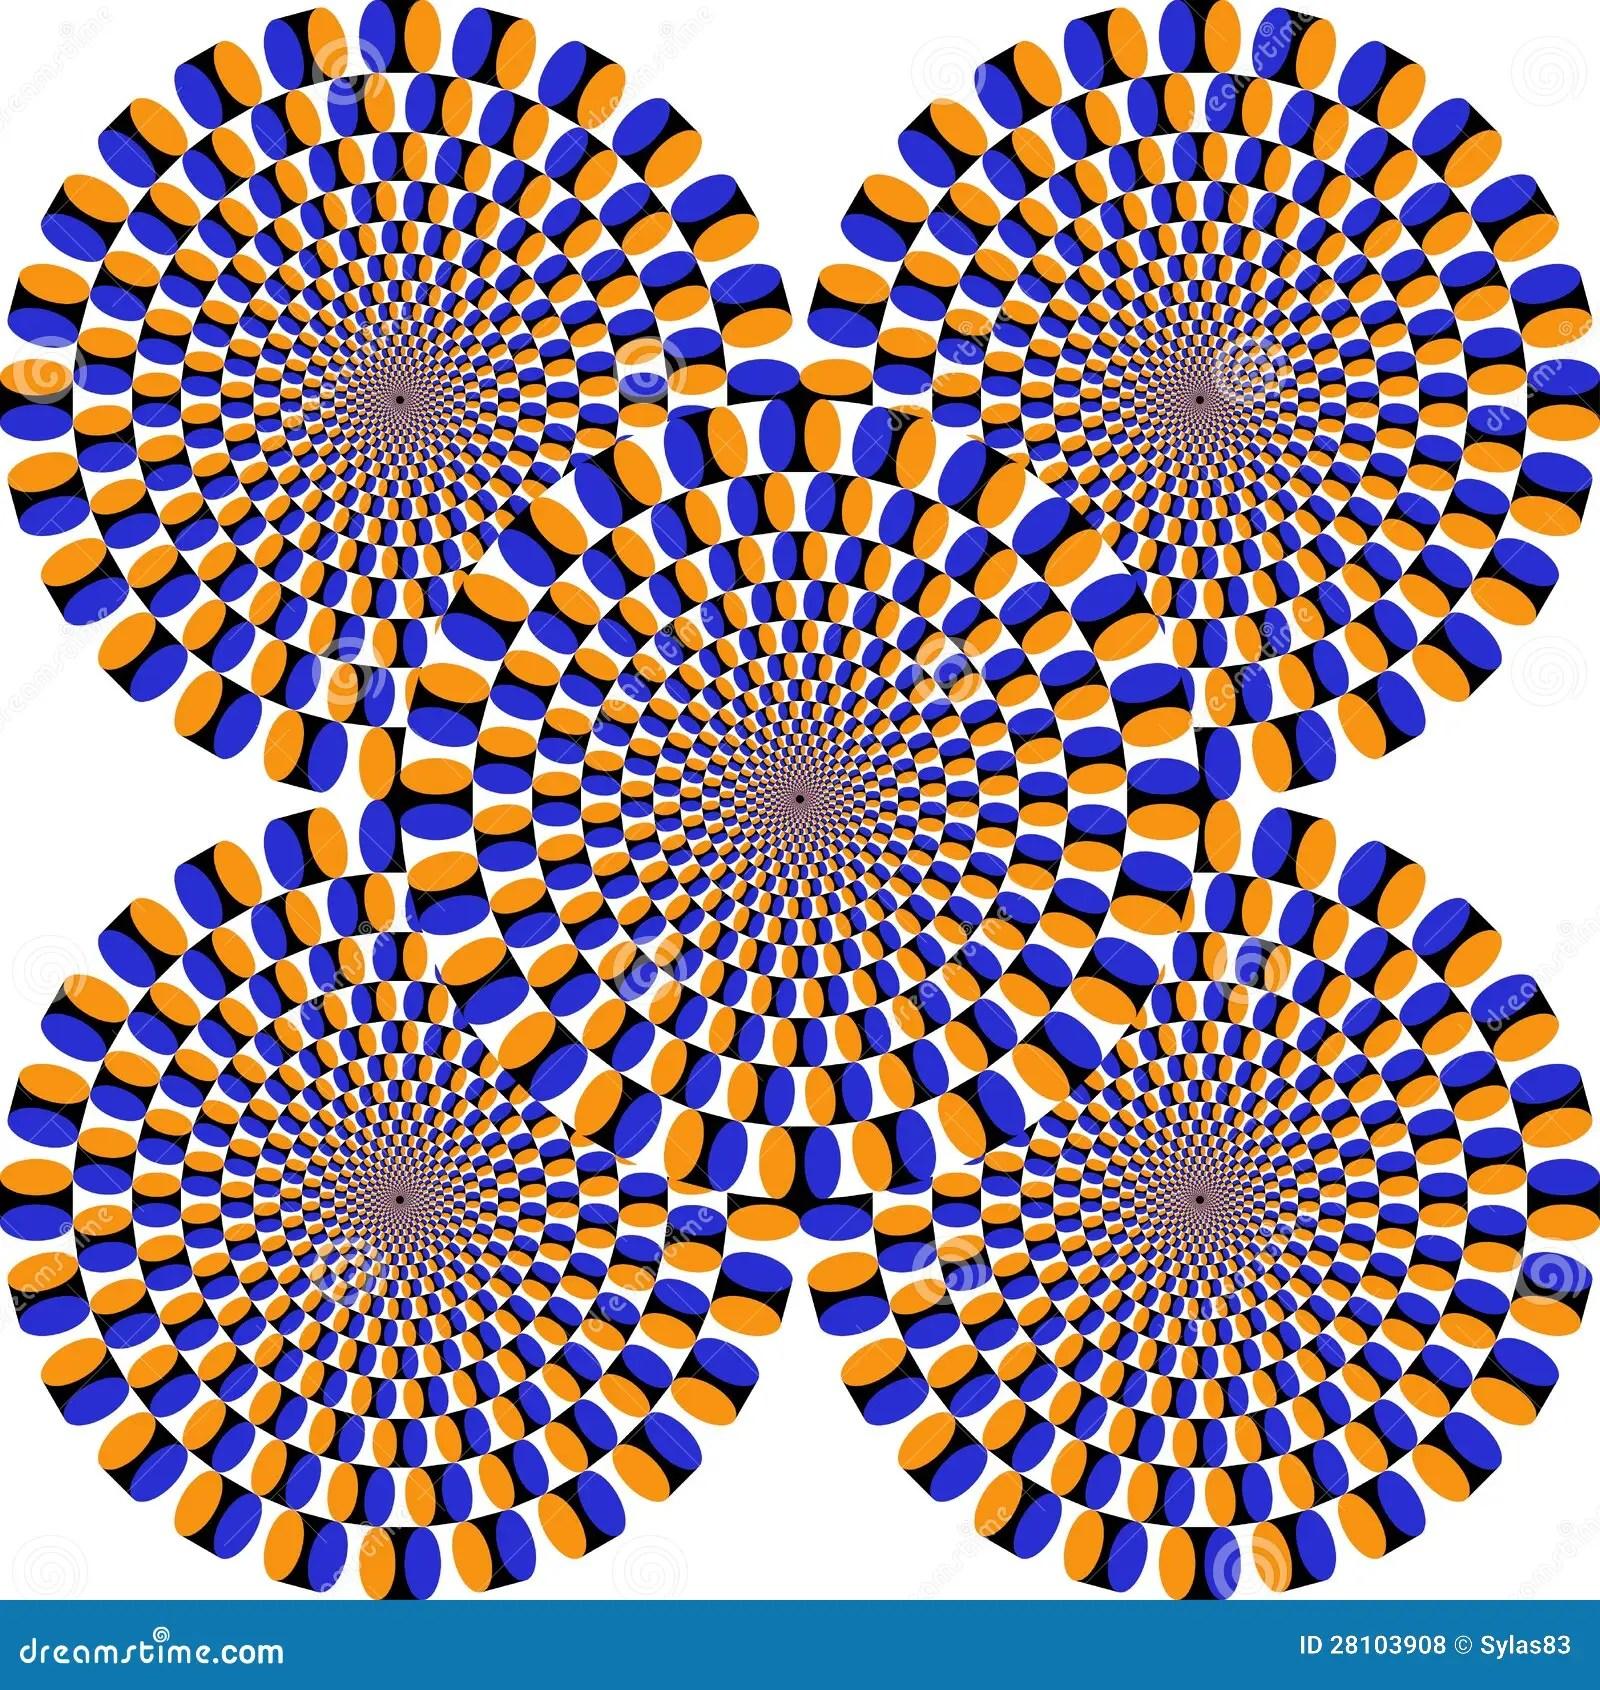 3d Max Wallpaper Texture Optical Illusion Colorful Blocks Royalty Free Stock